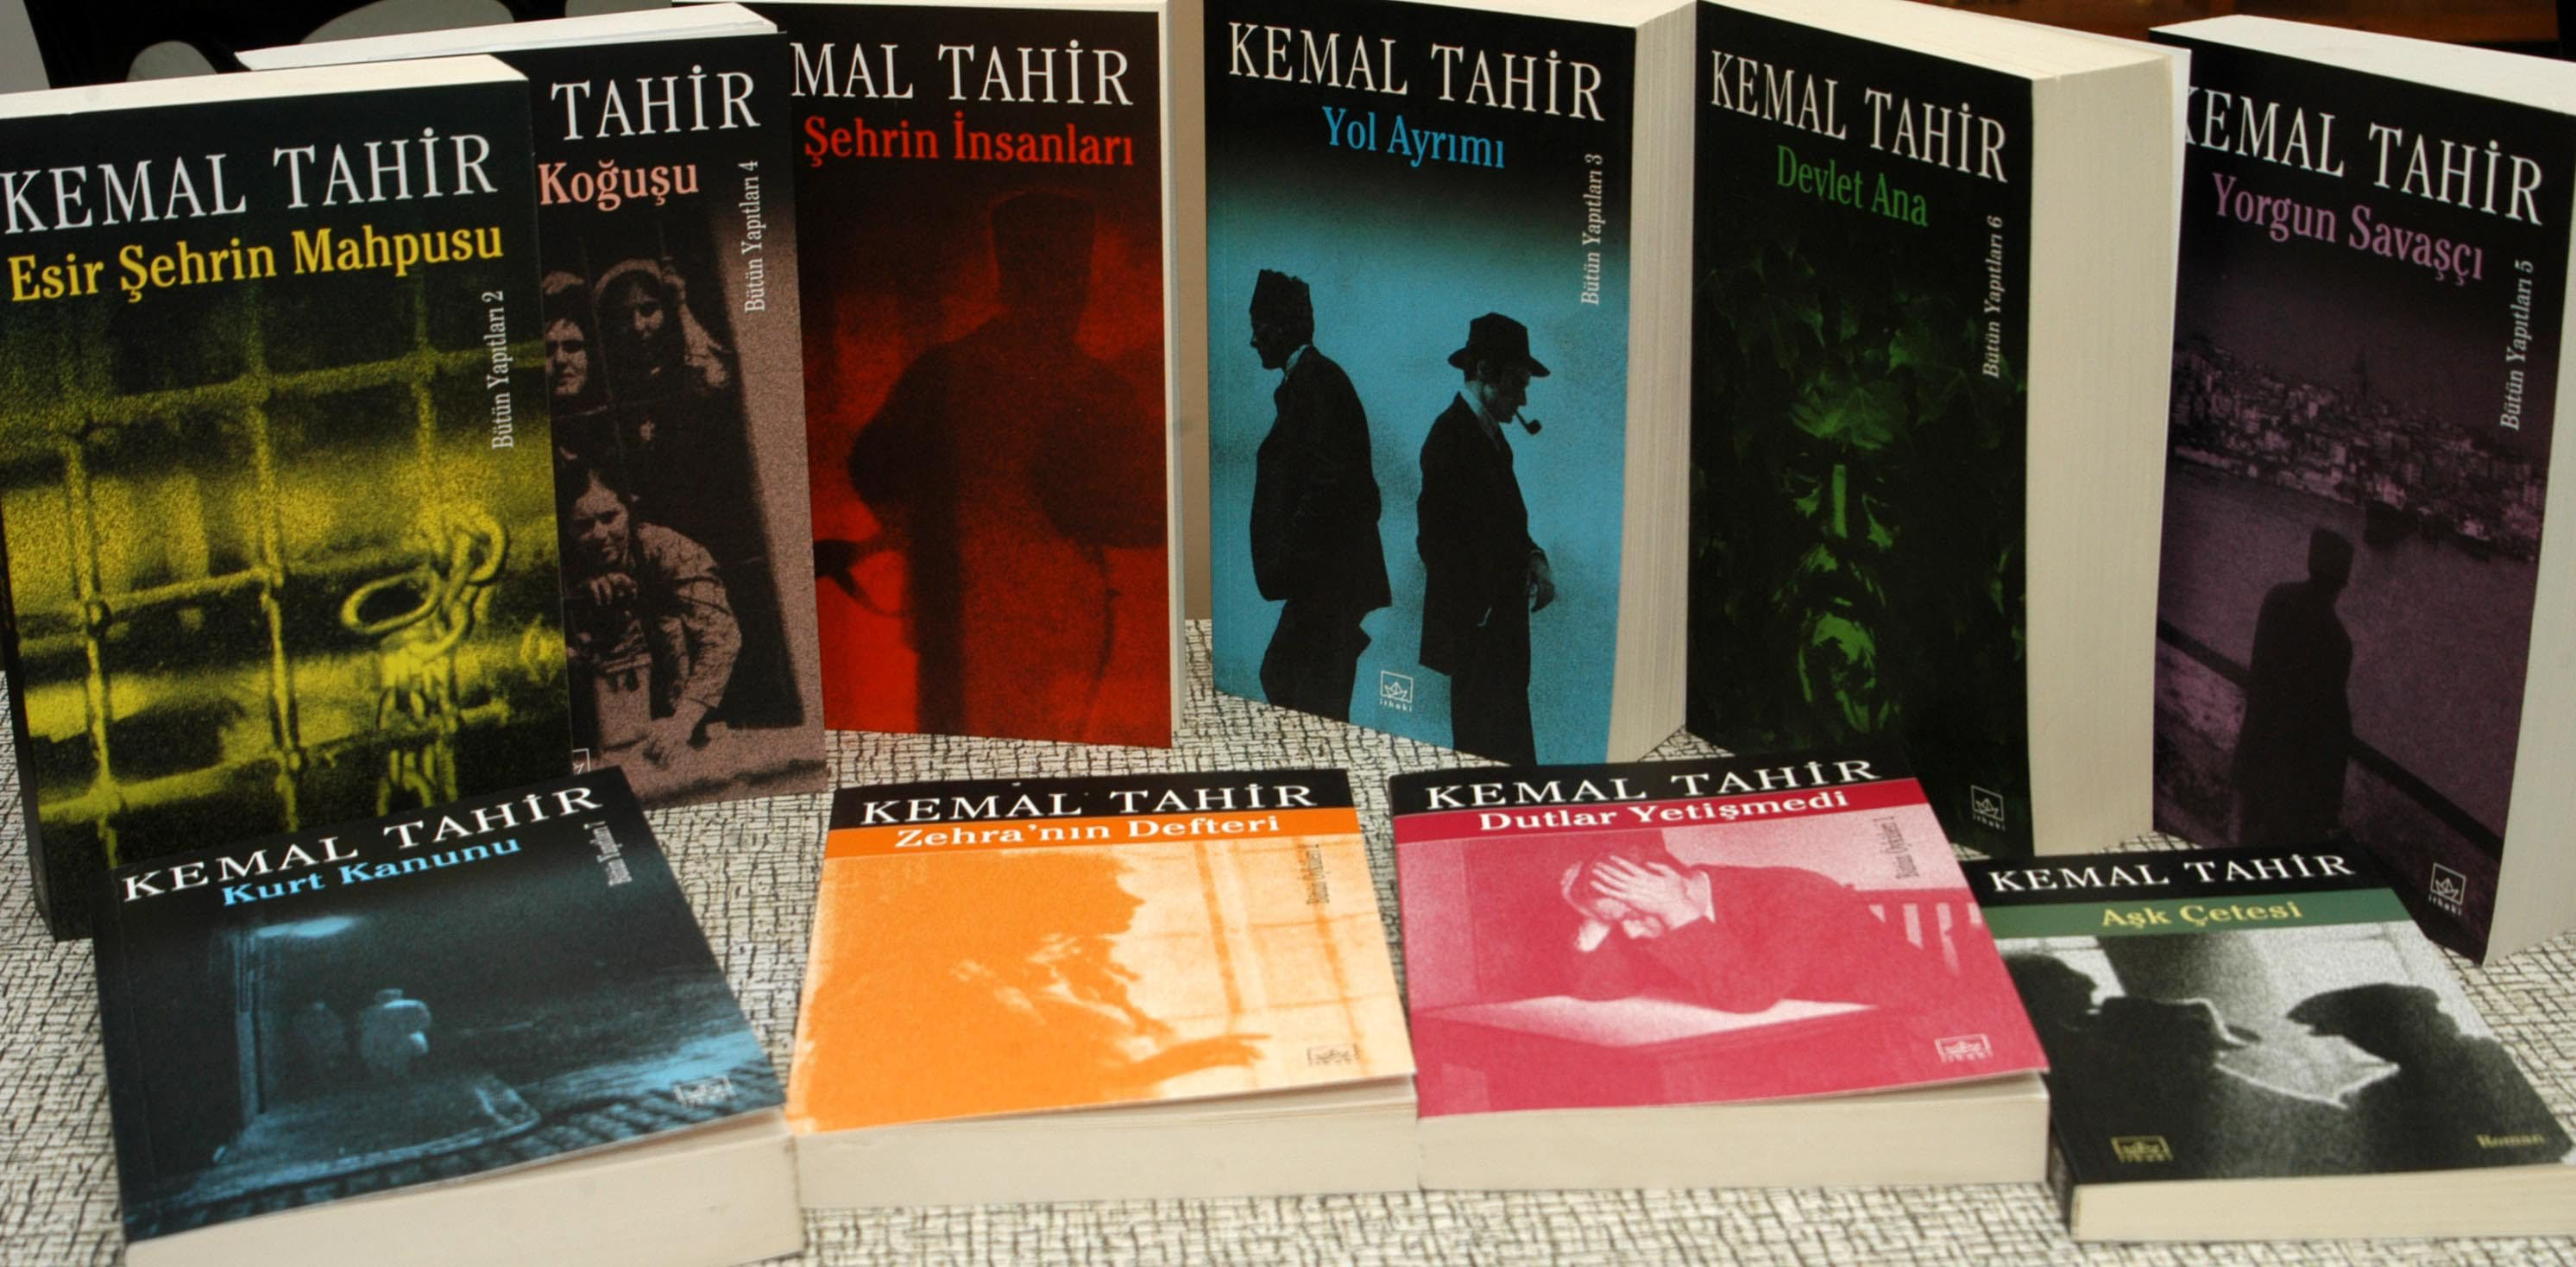 Some of Kemal Tahir's works. (Photo by Sadık Güleç via SABAH)